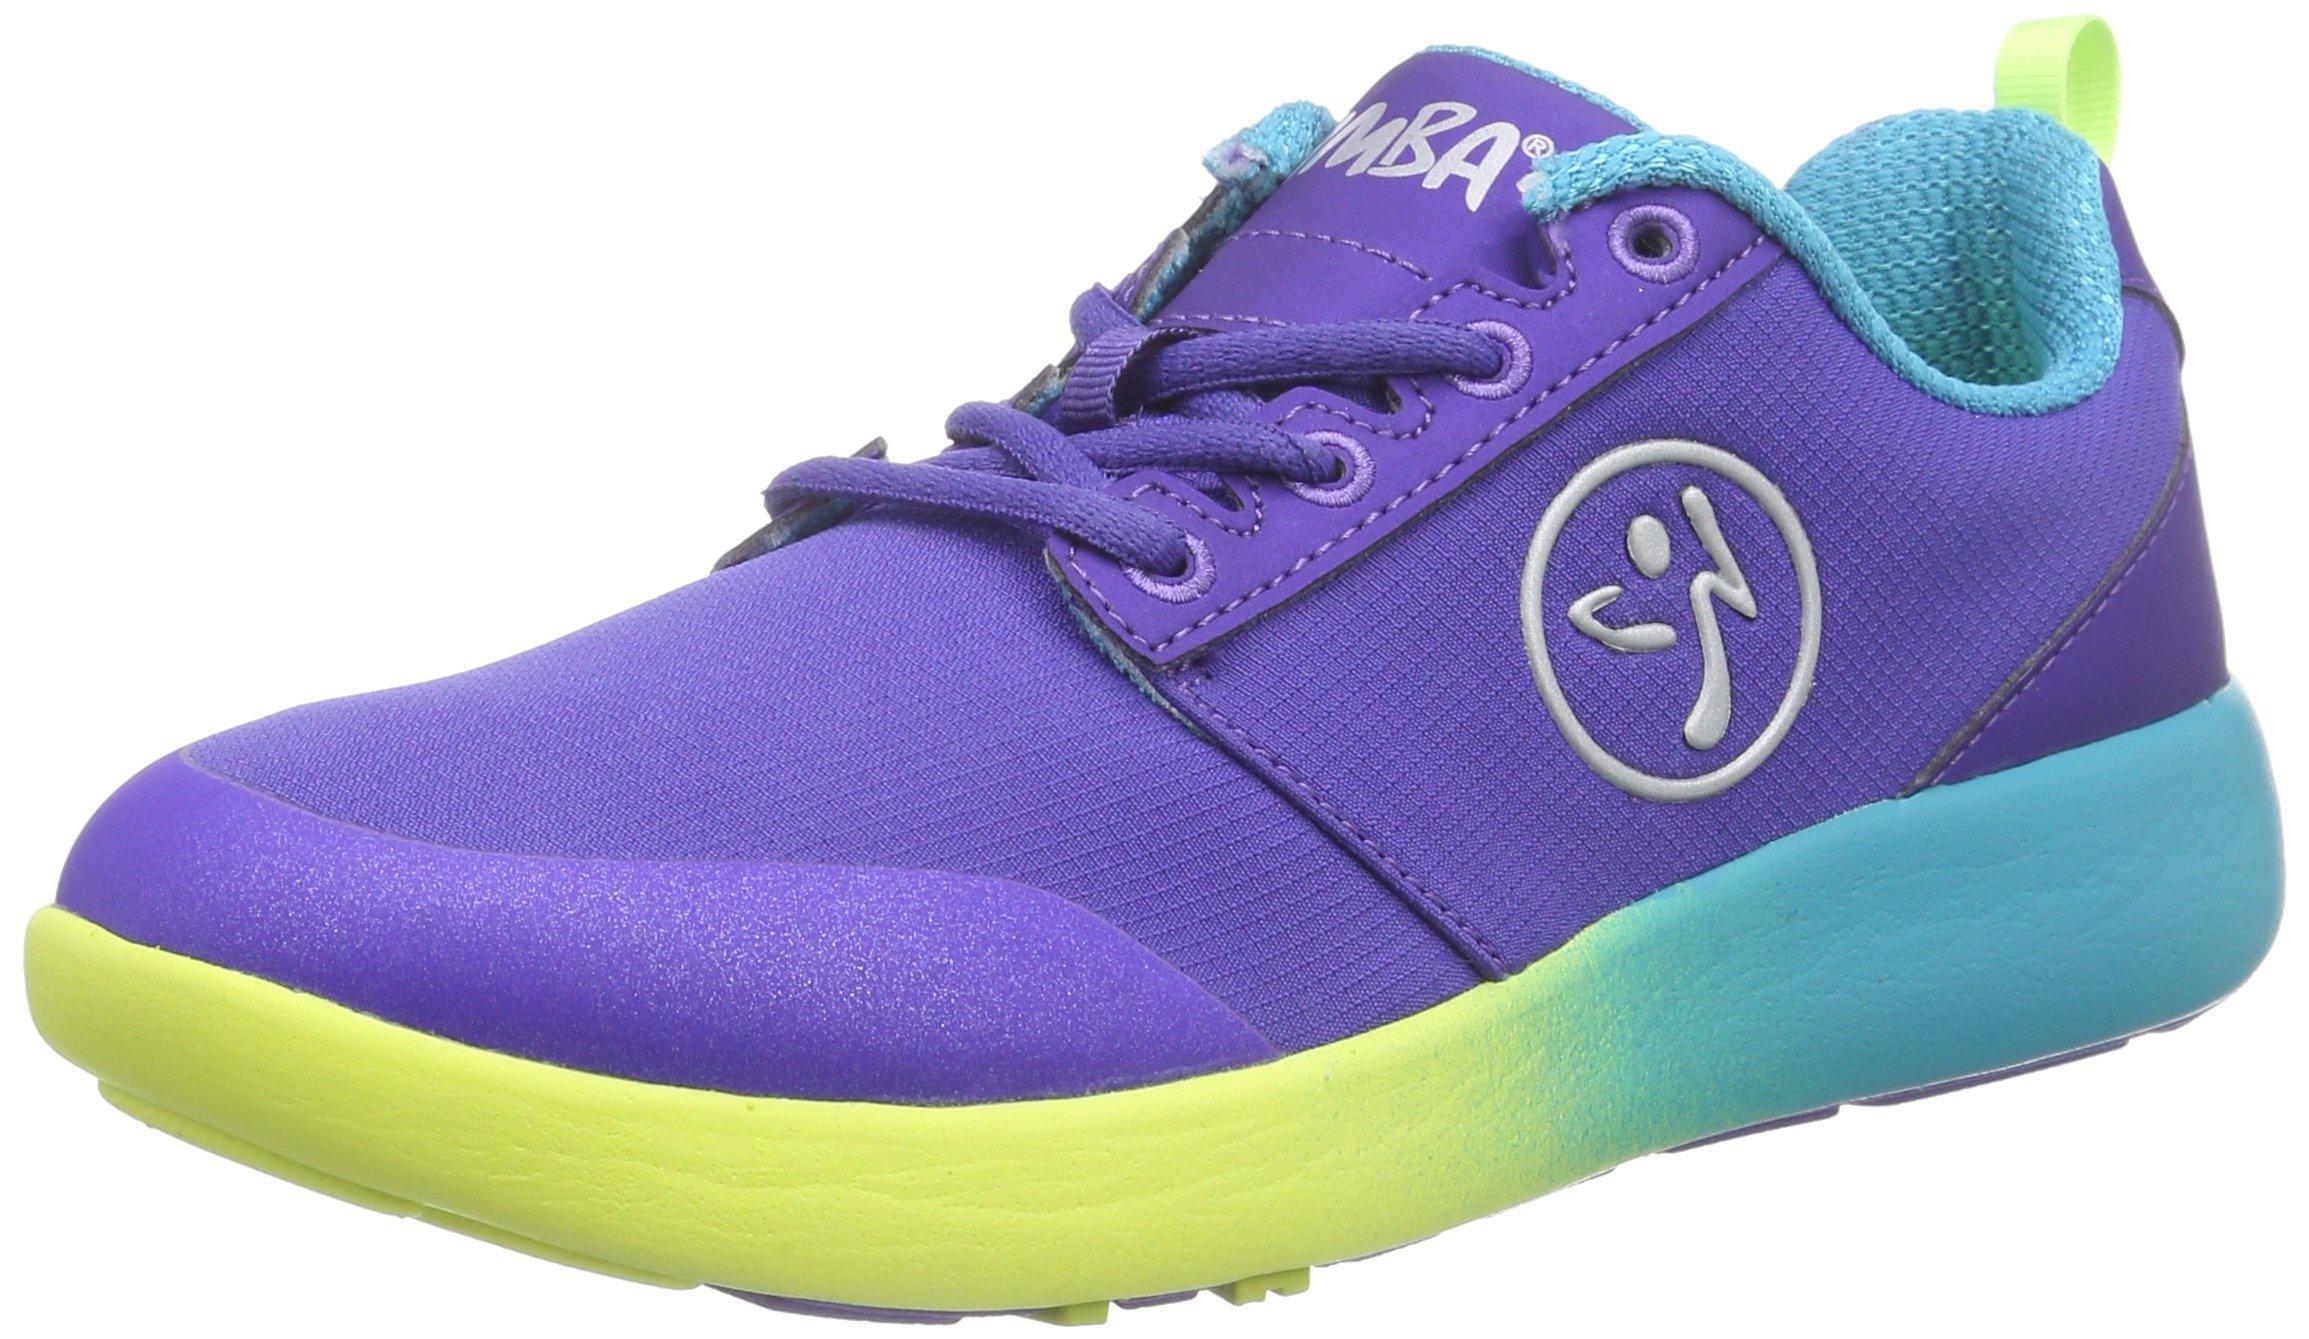 Zumba Women's Court Flow Dance Shoe, Purple, 6 M US